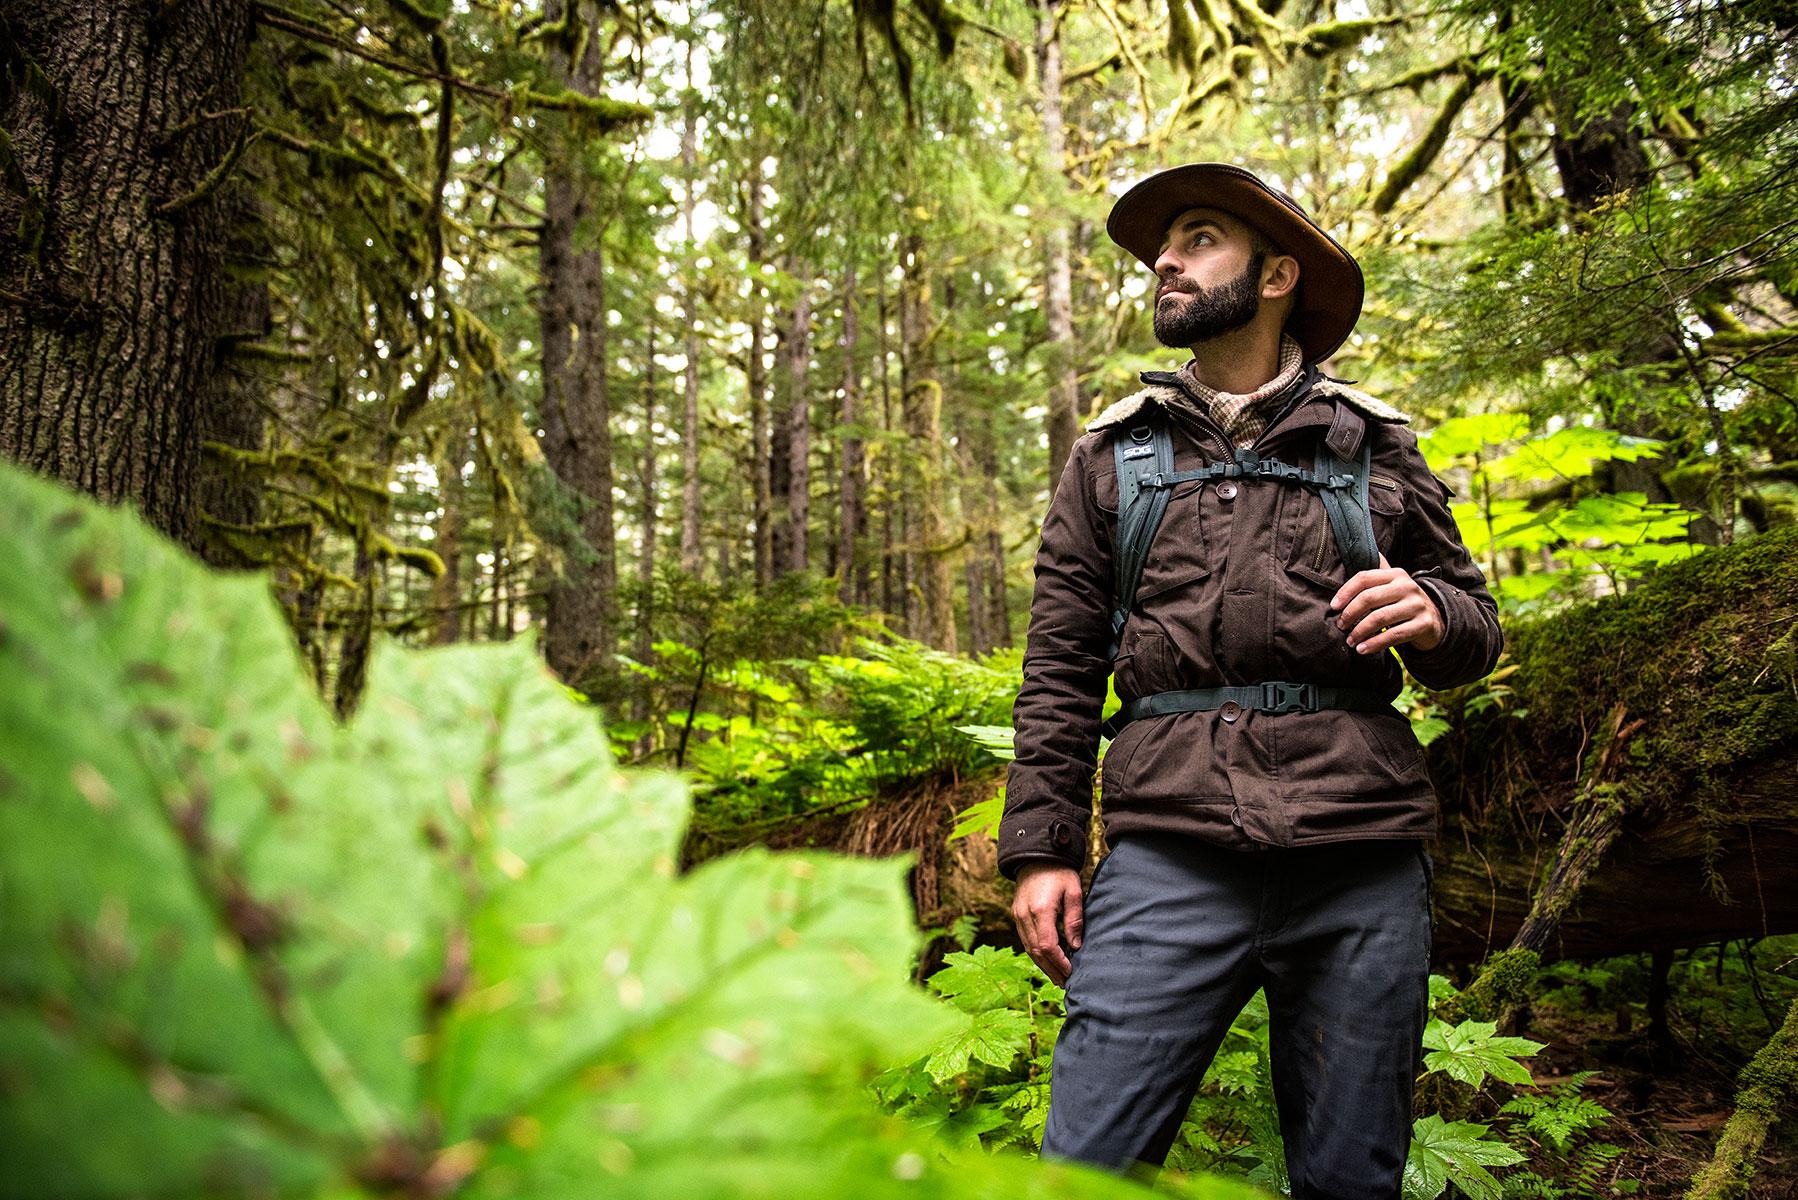 austin-trigg-brave-wilderness-alaska-BW-Coyote-Stands-Next-to-Bush.jpg